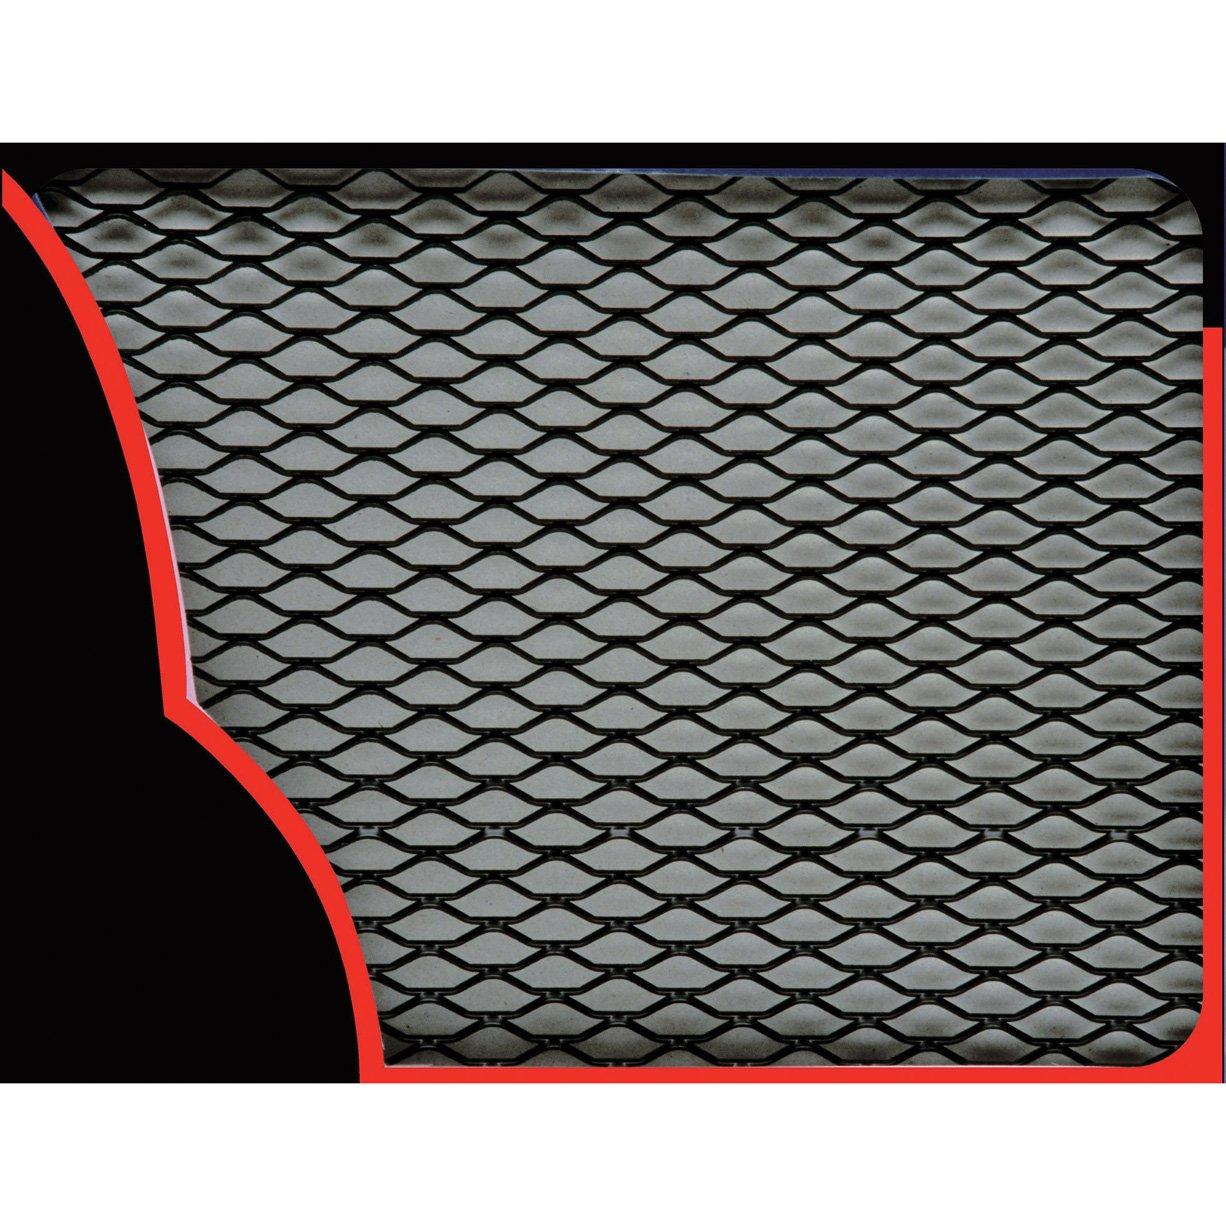 Sumex Silver Aluminium 33 x 100cm Car Grill Grille Vent Mesh Silver Hexagon Type